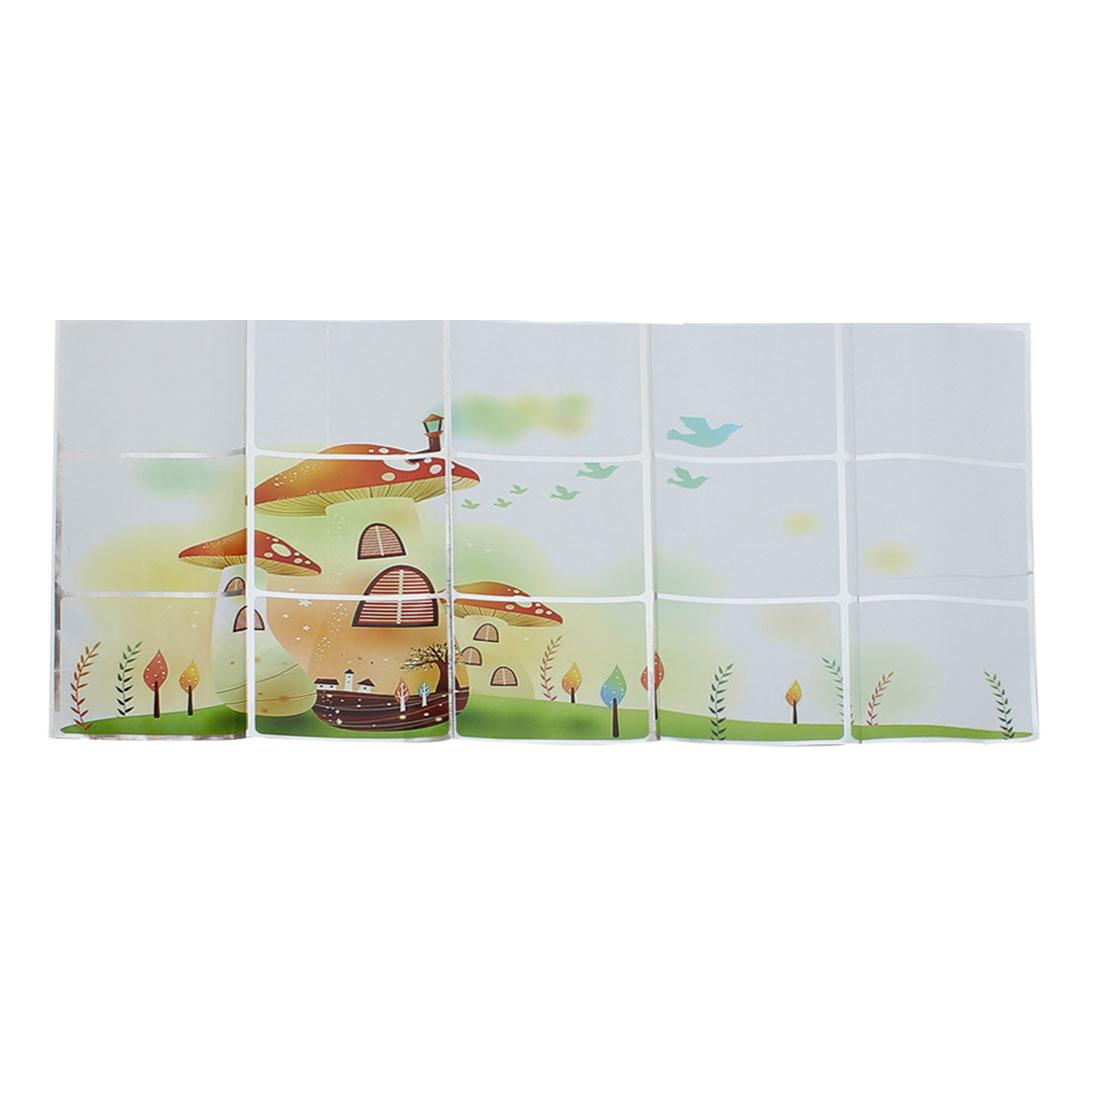 Mushroom Pattern Self-adhesive Kitchen Room Decor Wall Sticker Decal